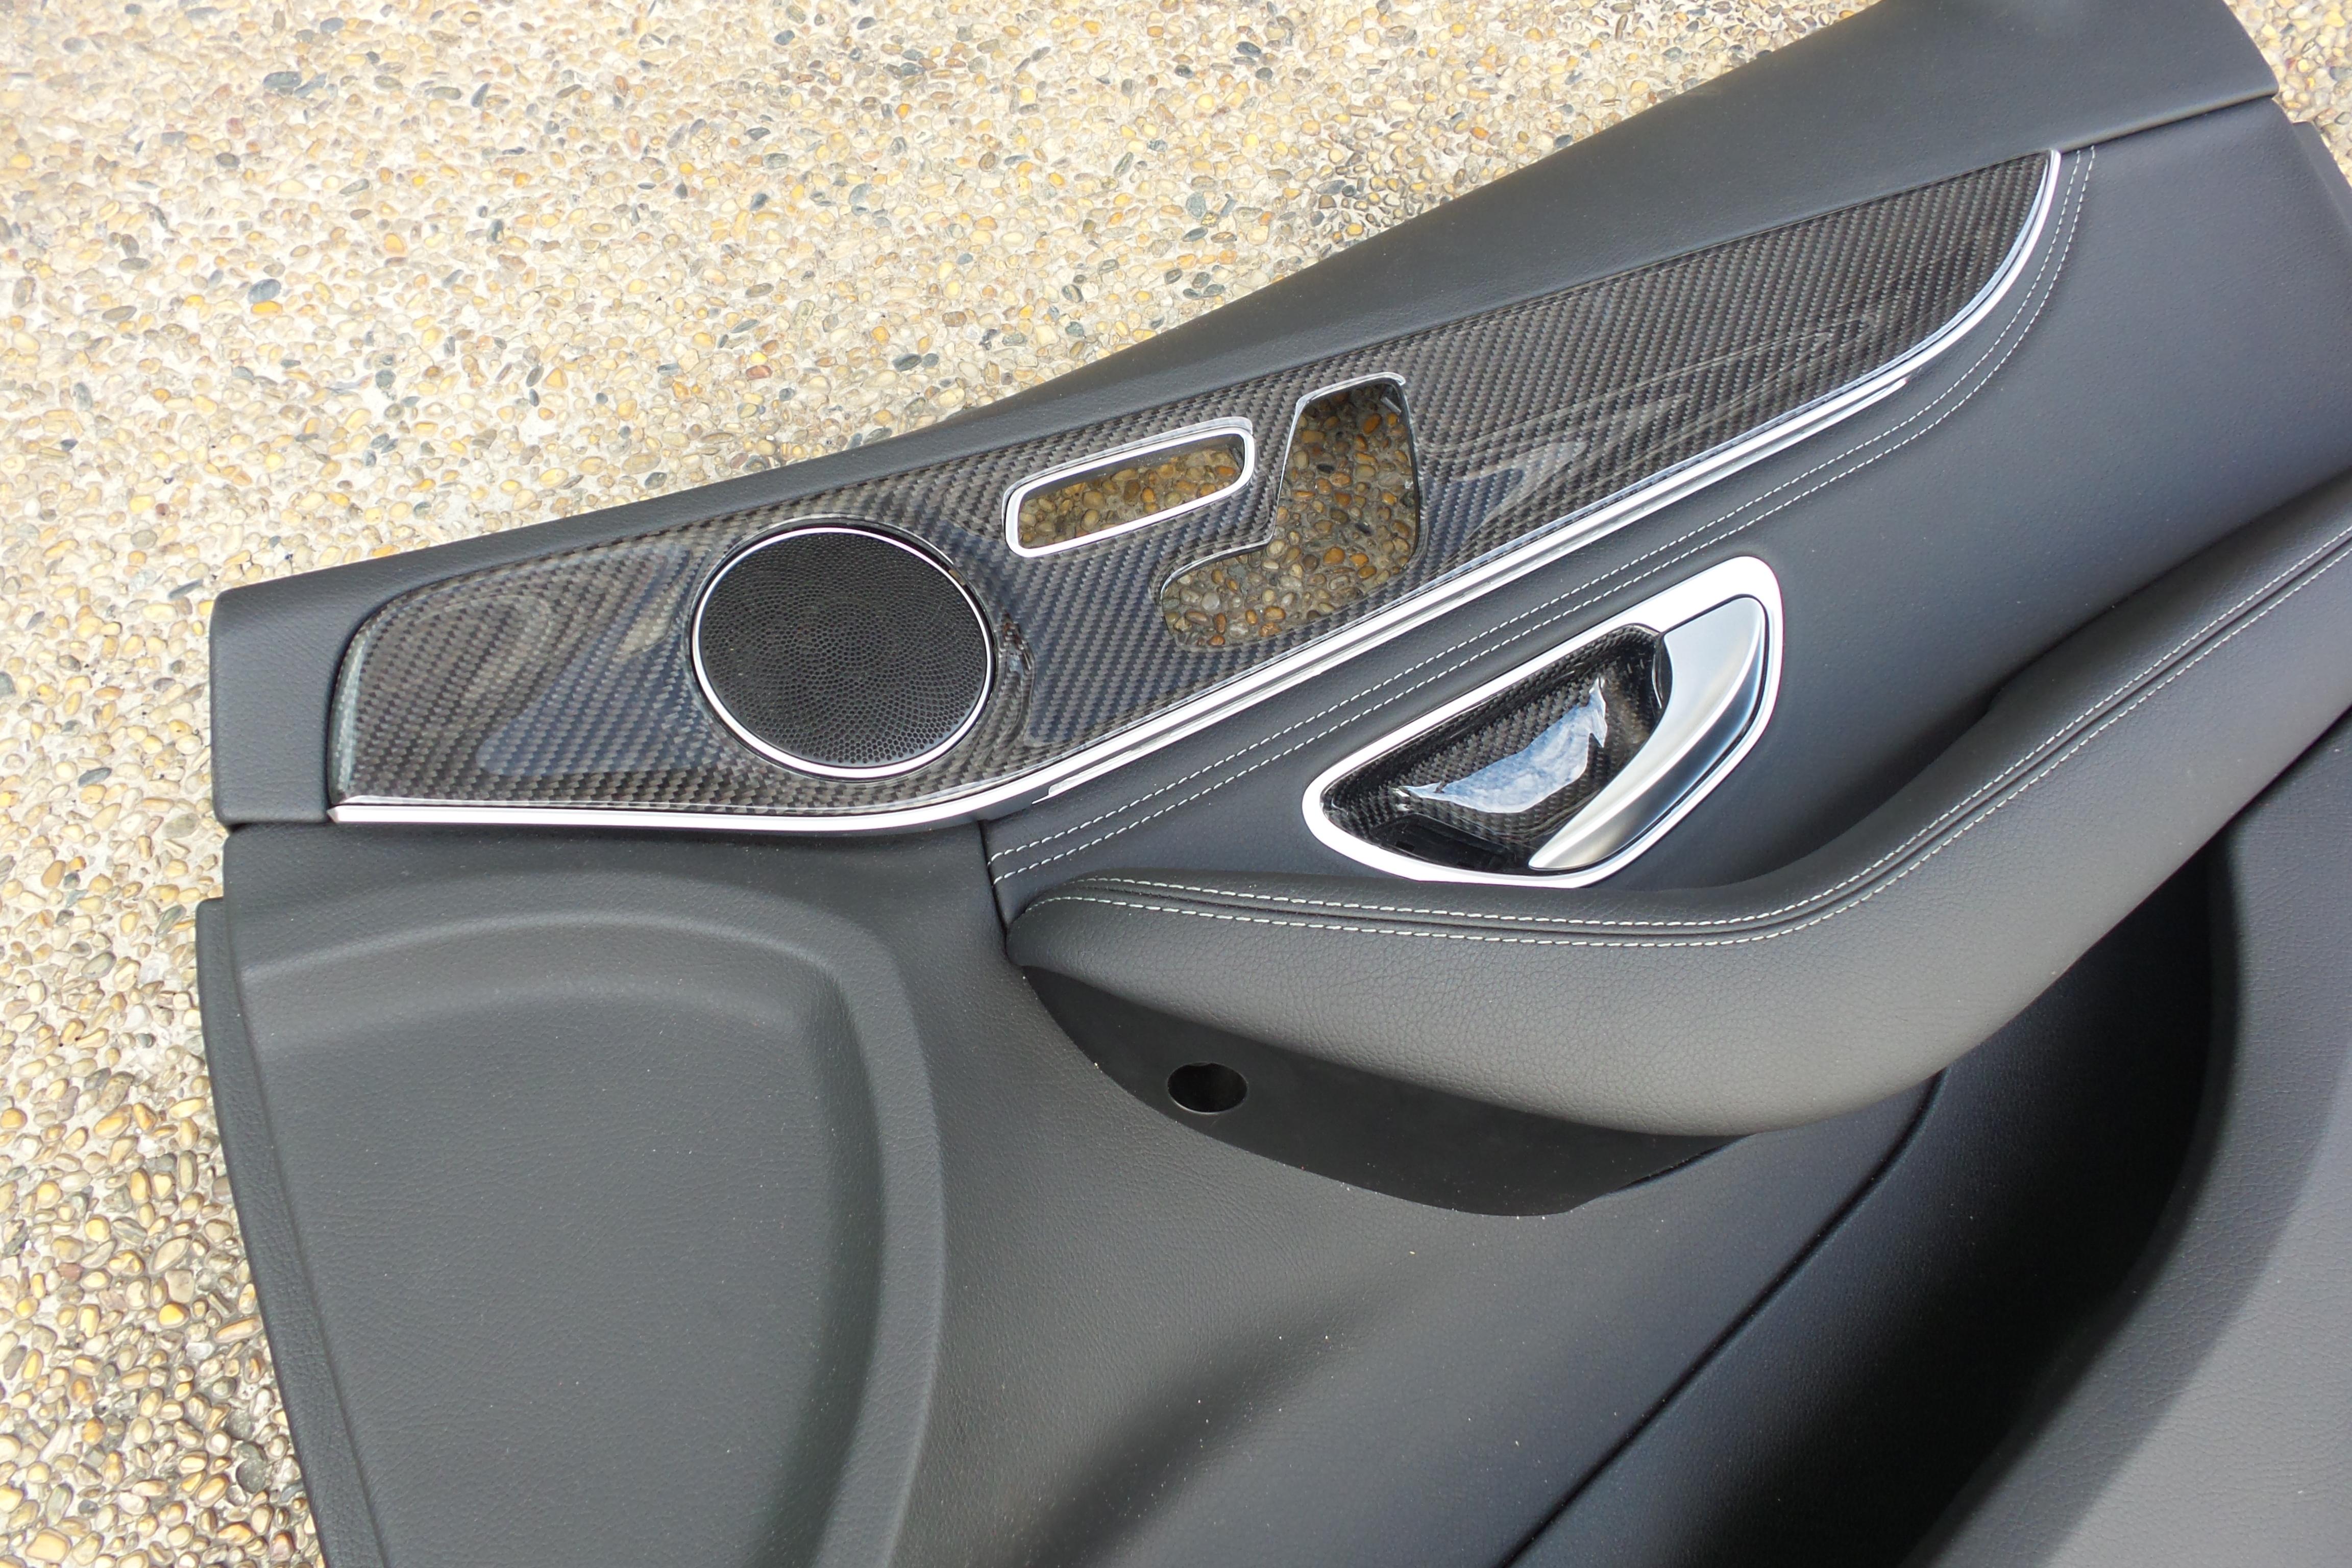 Mercedes W205 Door Trim Set Sedan Robson Design Carbon Fiber Car Accessories Interior